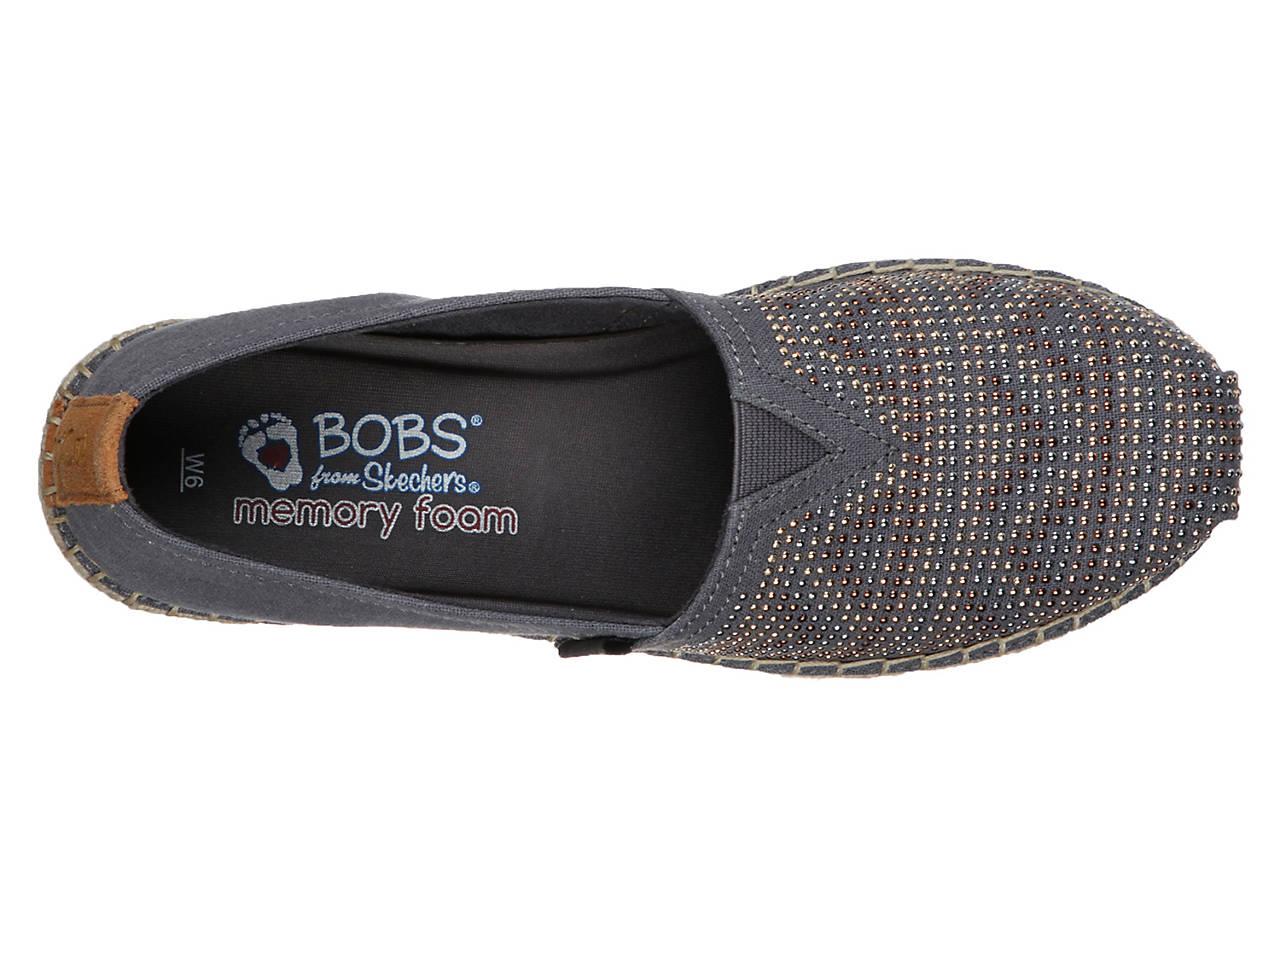 395e24b9fc99f Skechers BOBS Breeze Moonbeams & Stars Espadrille Slip-On Women's ...